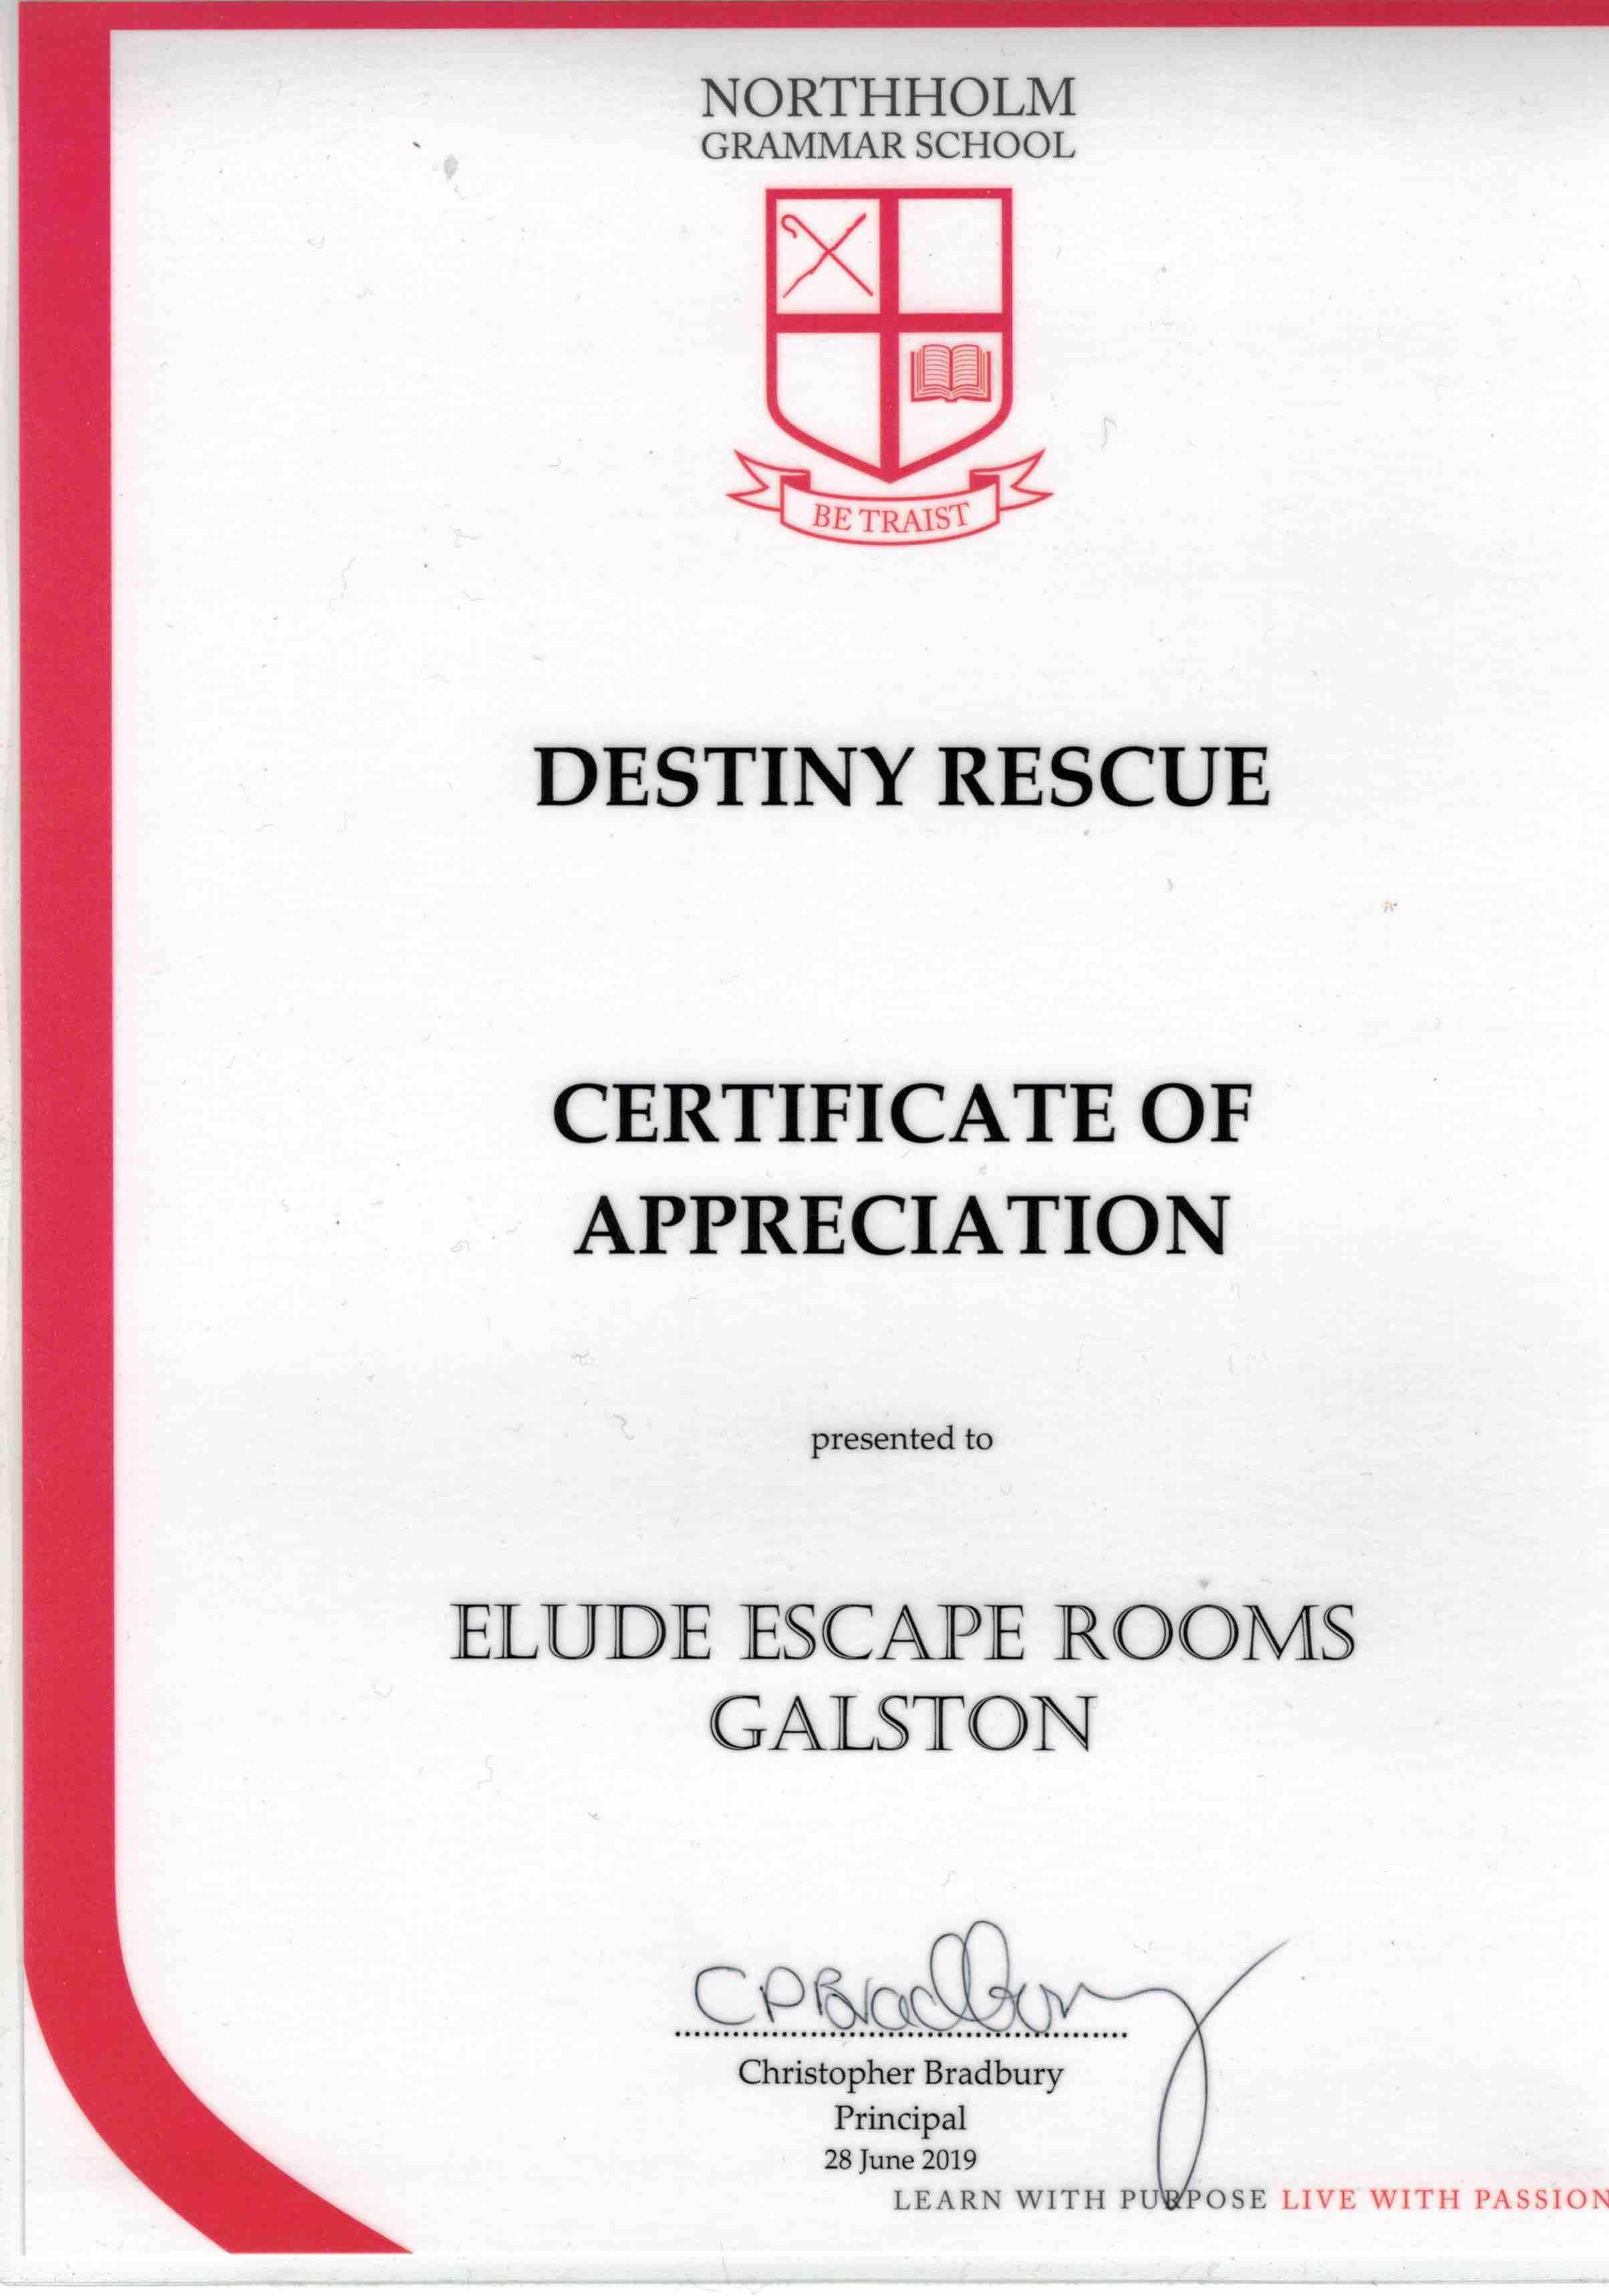 Certificate of Appreciation from Destiny Rescue